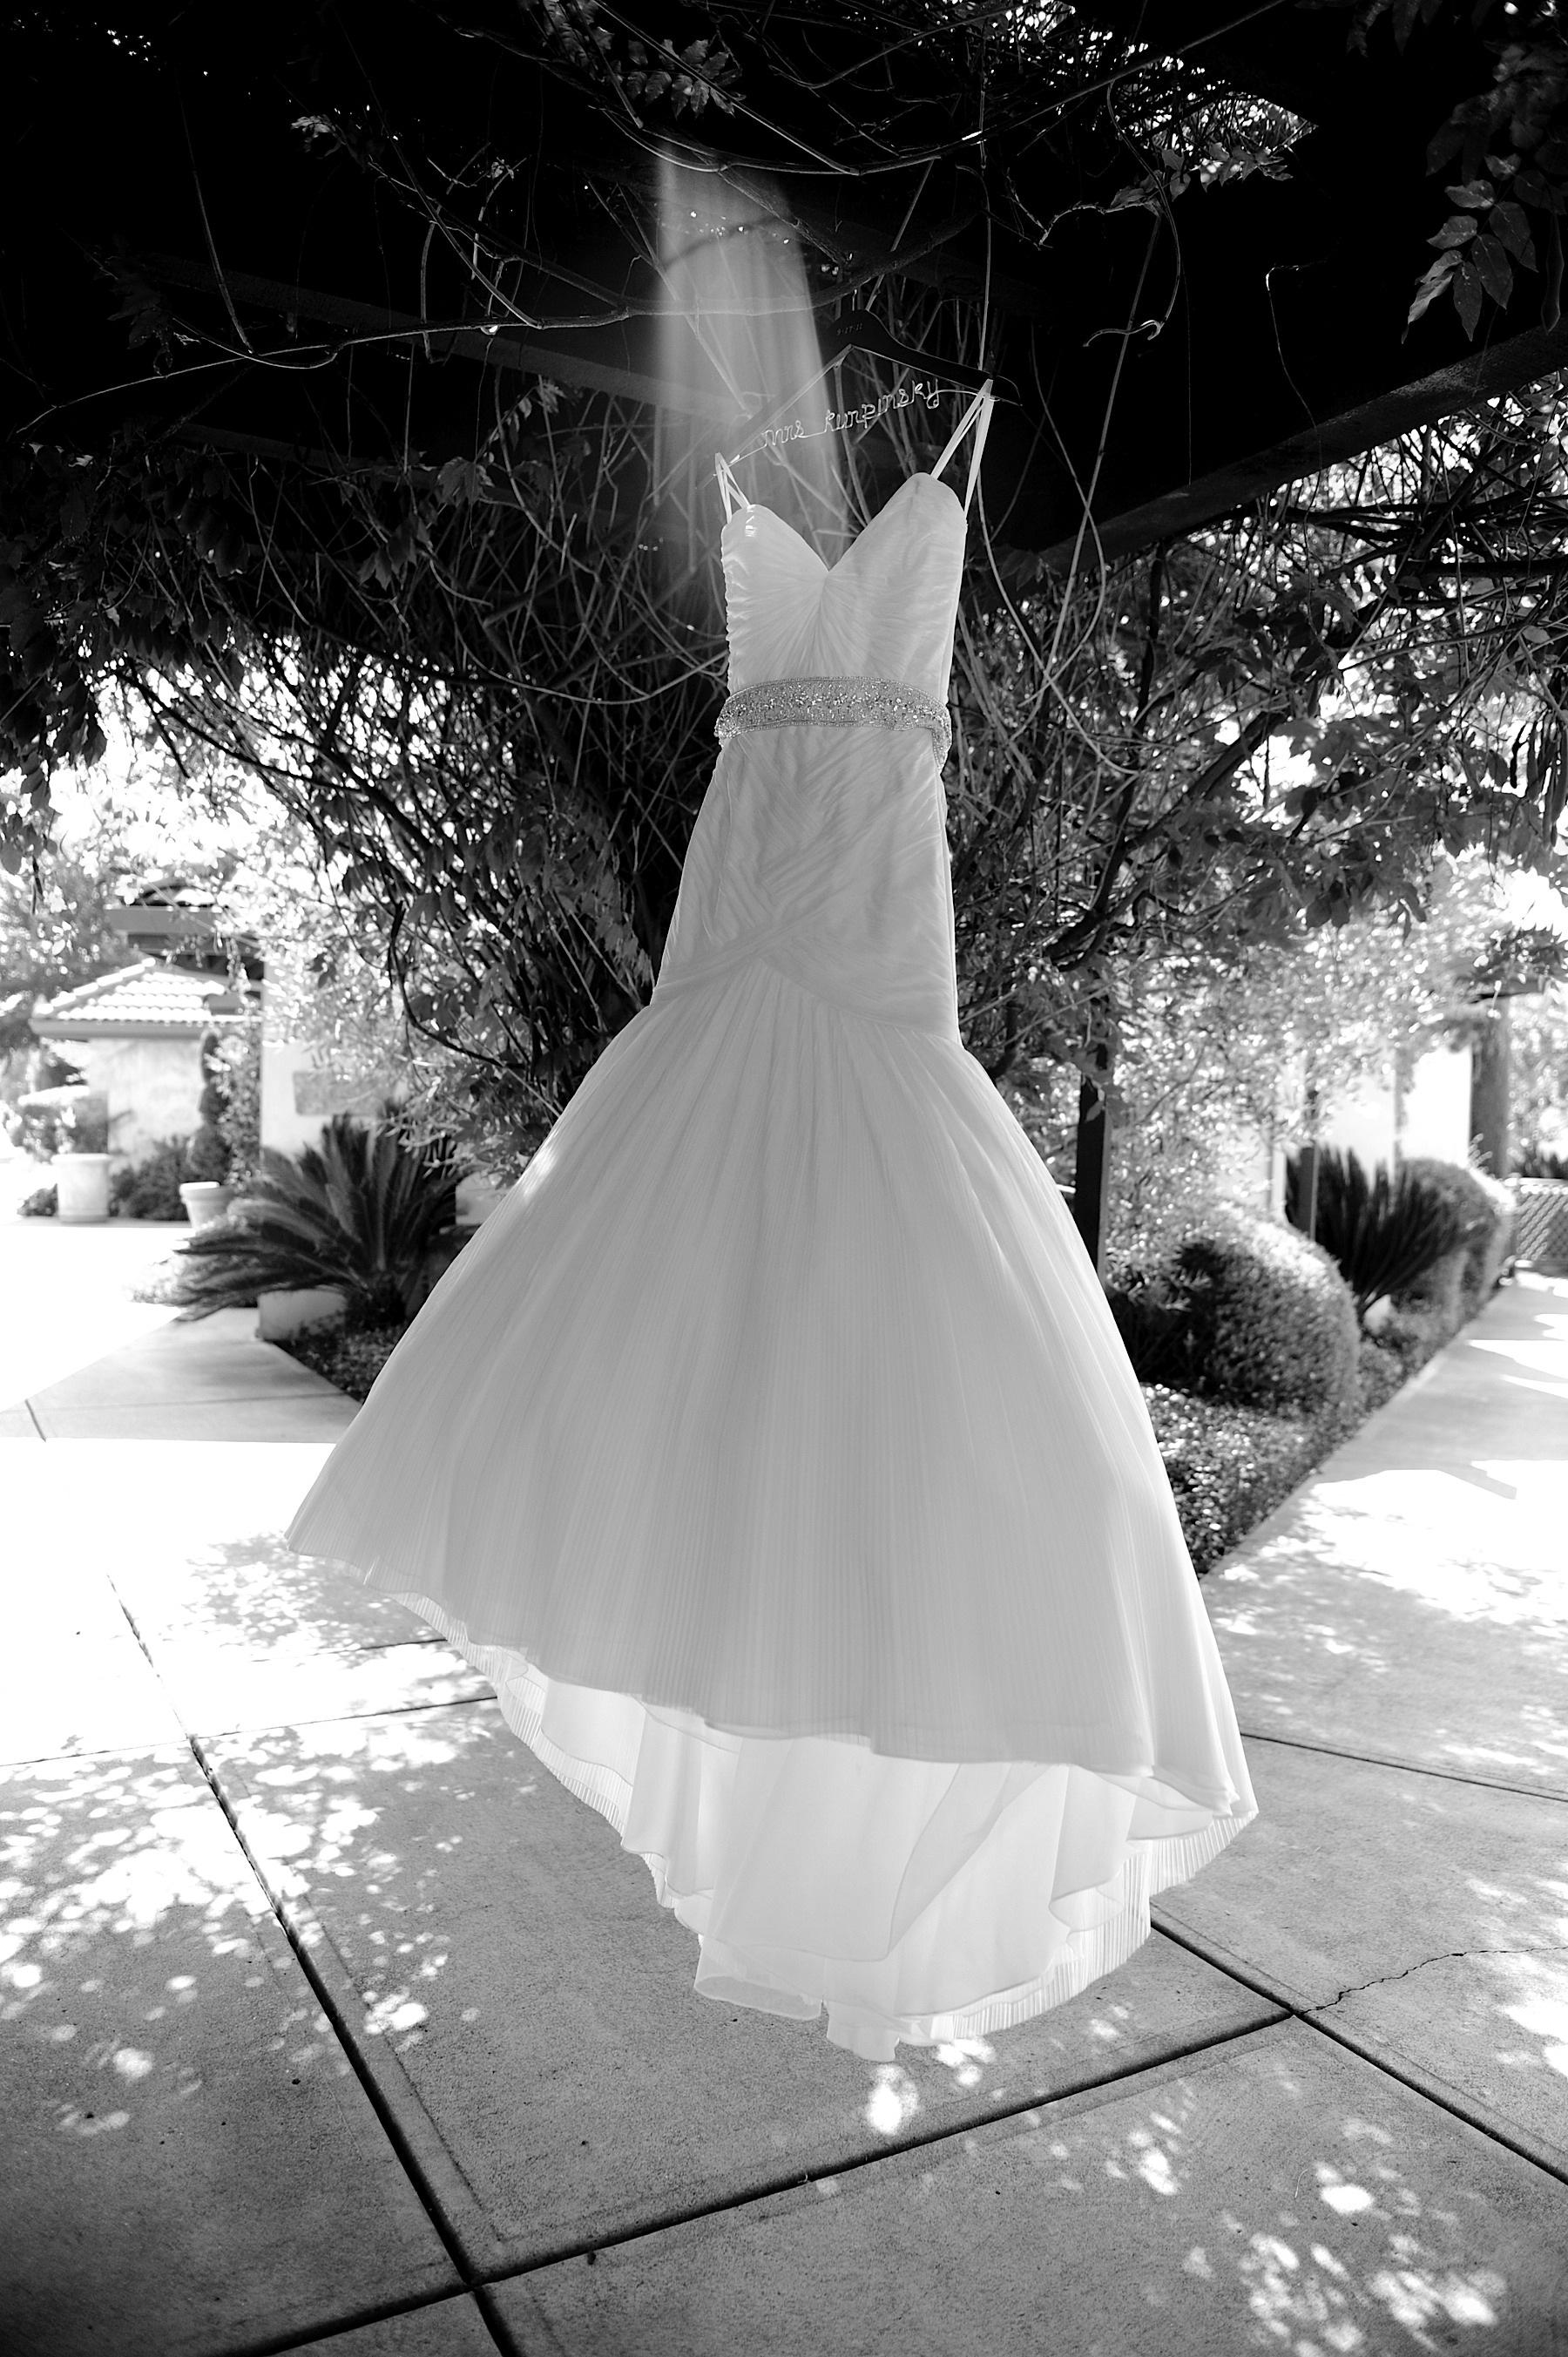 The Vintage Inn / Villagio Inn & Spa Napa Wedding Photographer